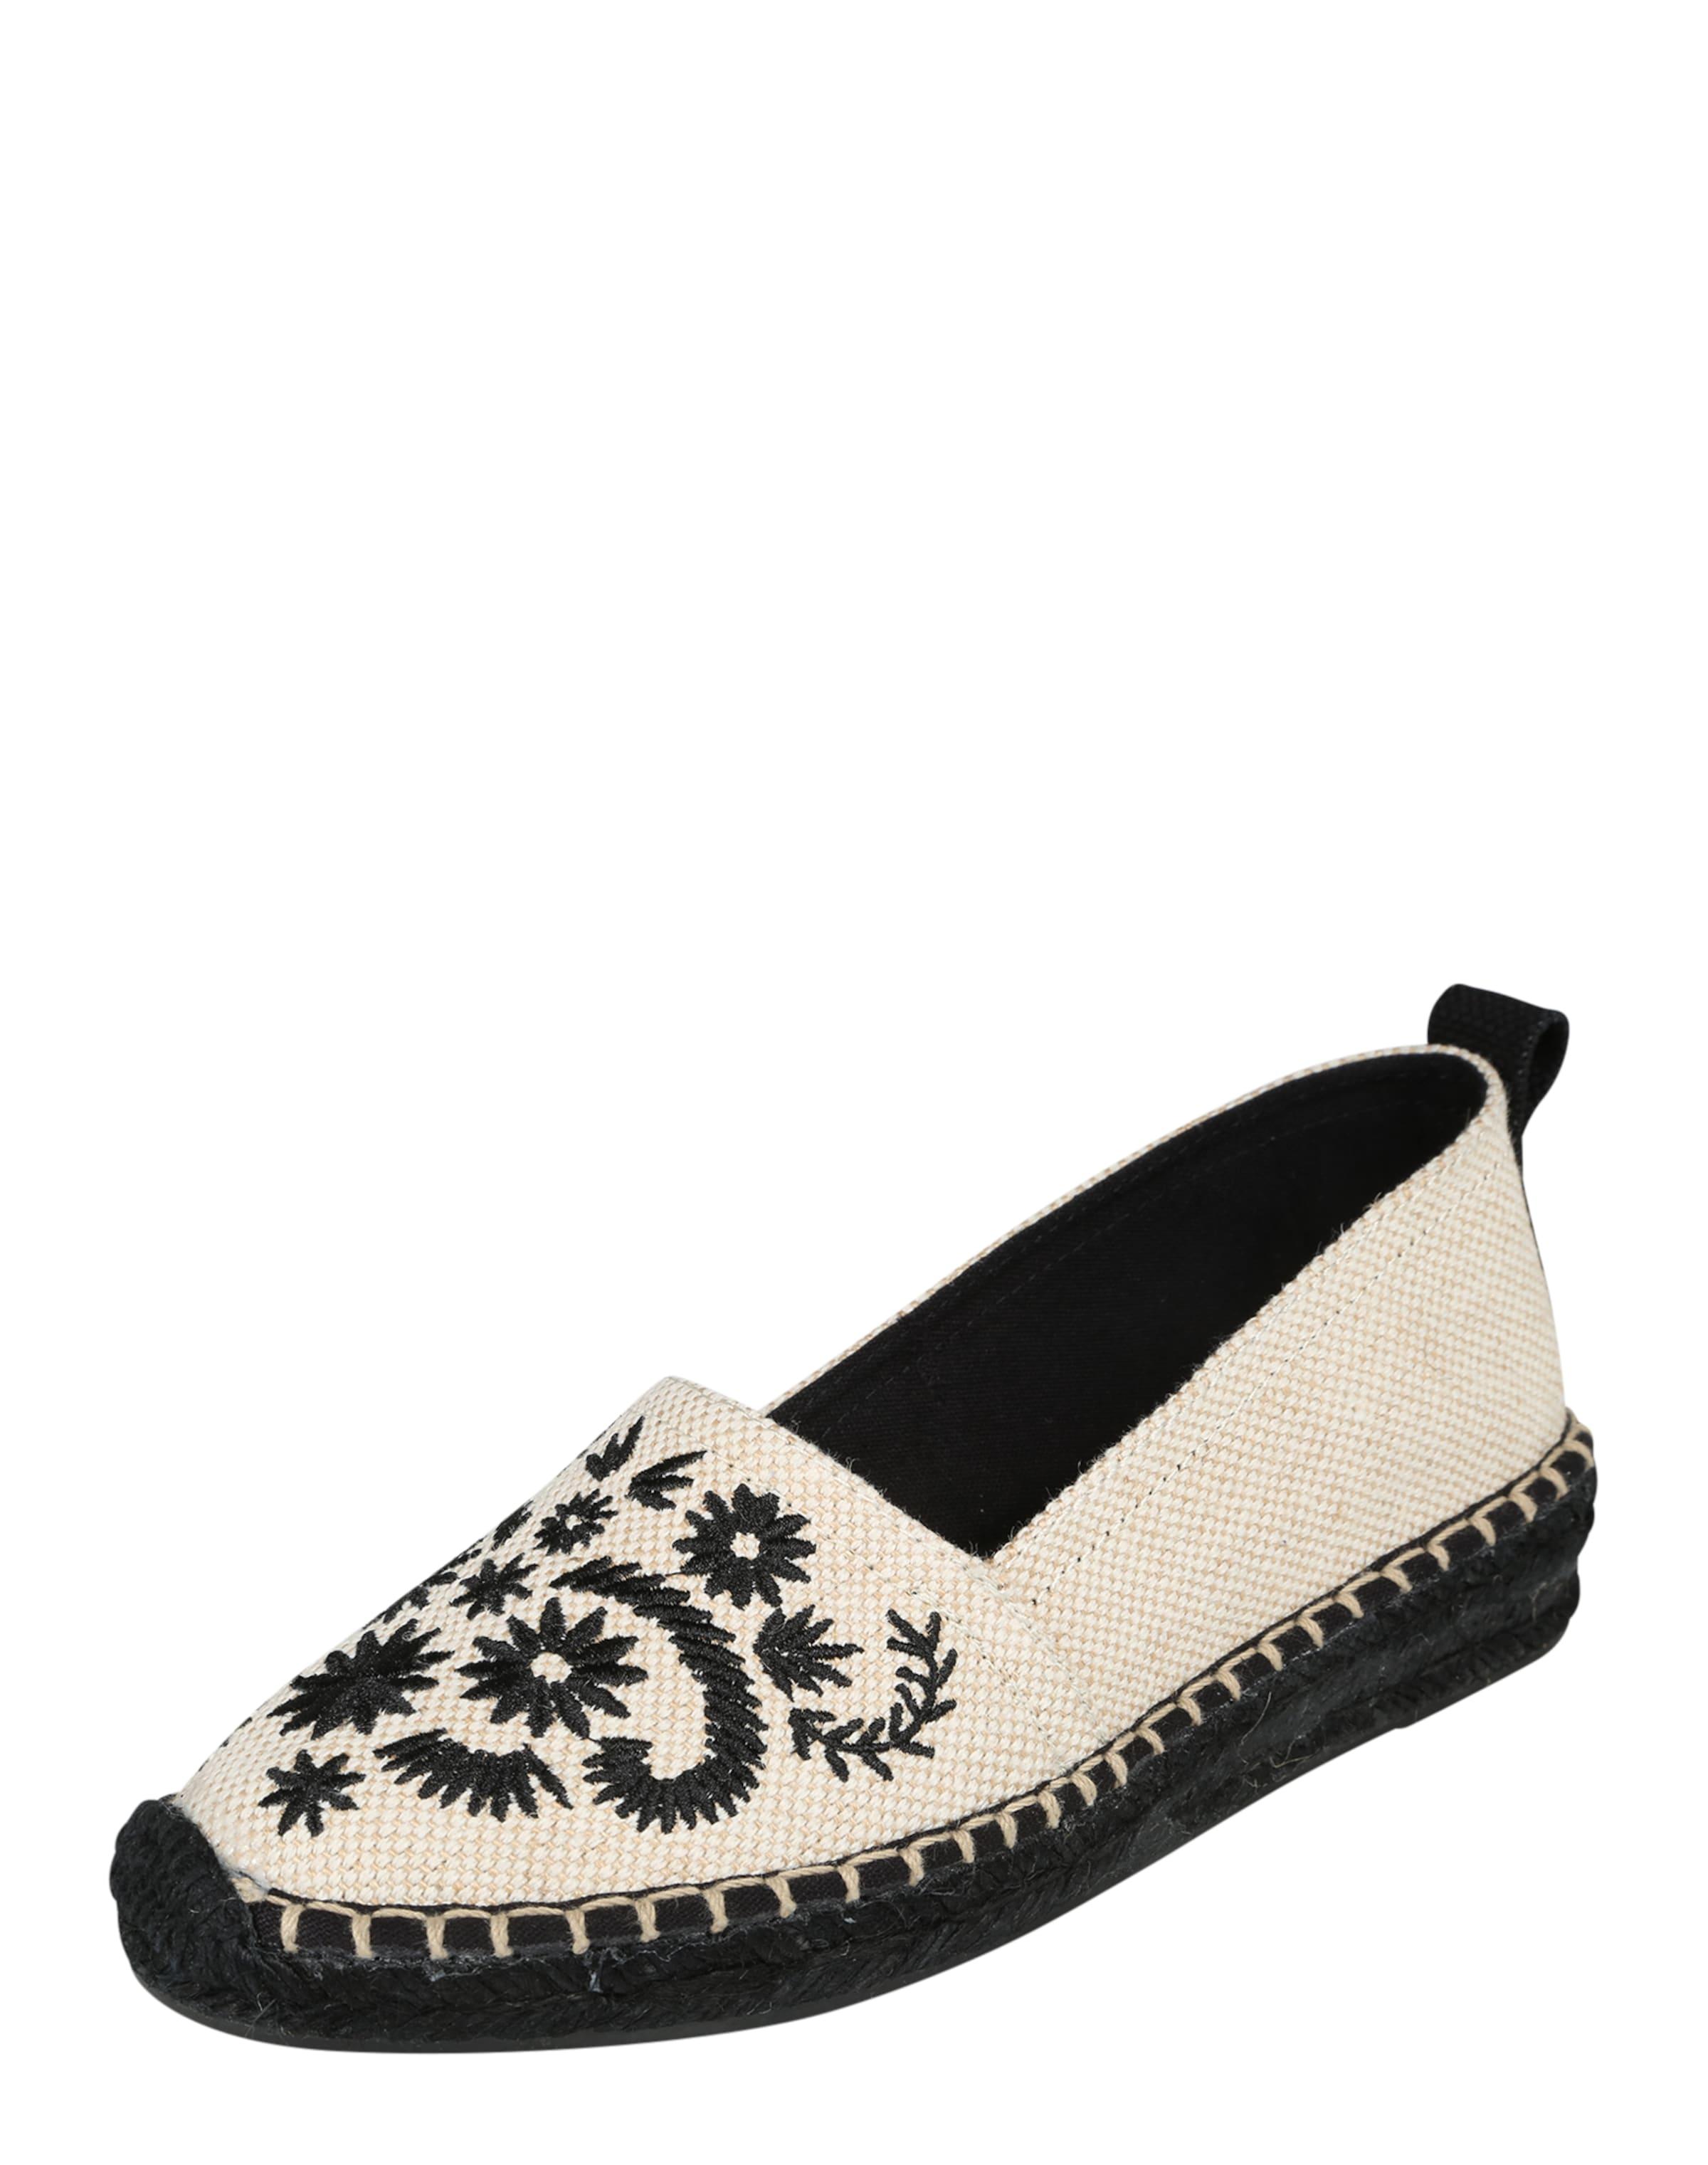 Haltbare Mode billige Schuhe ESPRIT | Espadrilles 'Ines Flower' Schuhe Gut getragene Schuhe